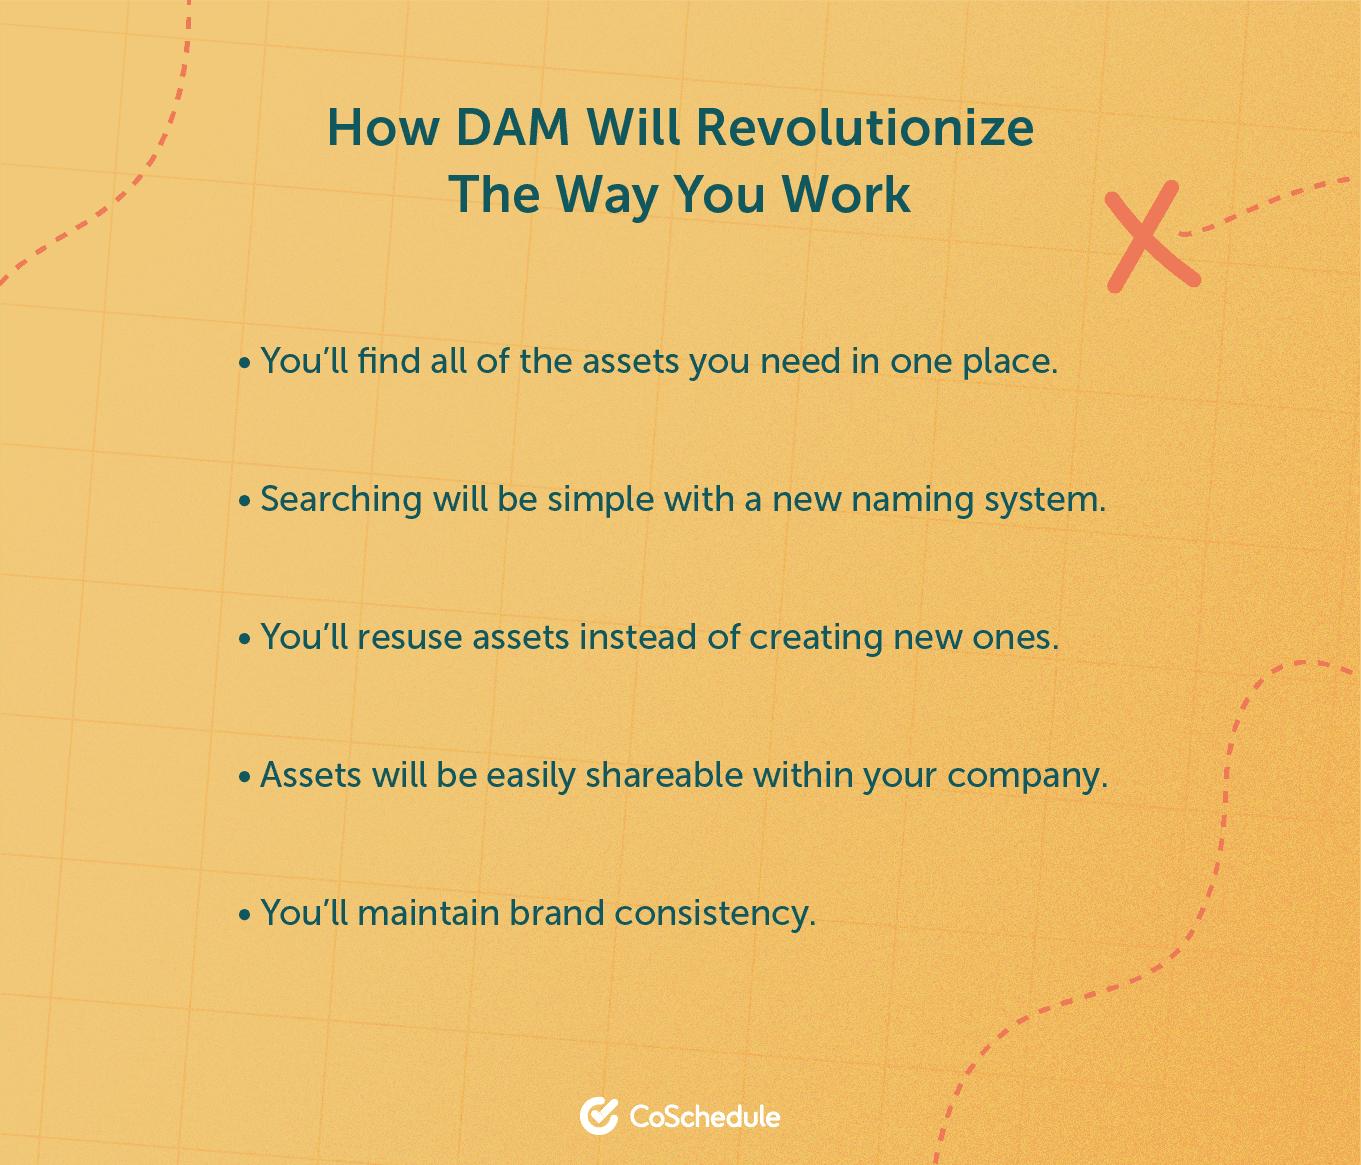 How DAM will revolutionize the way you work